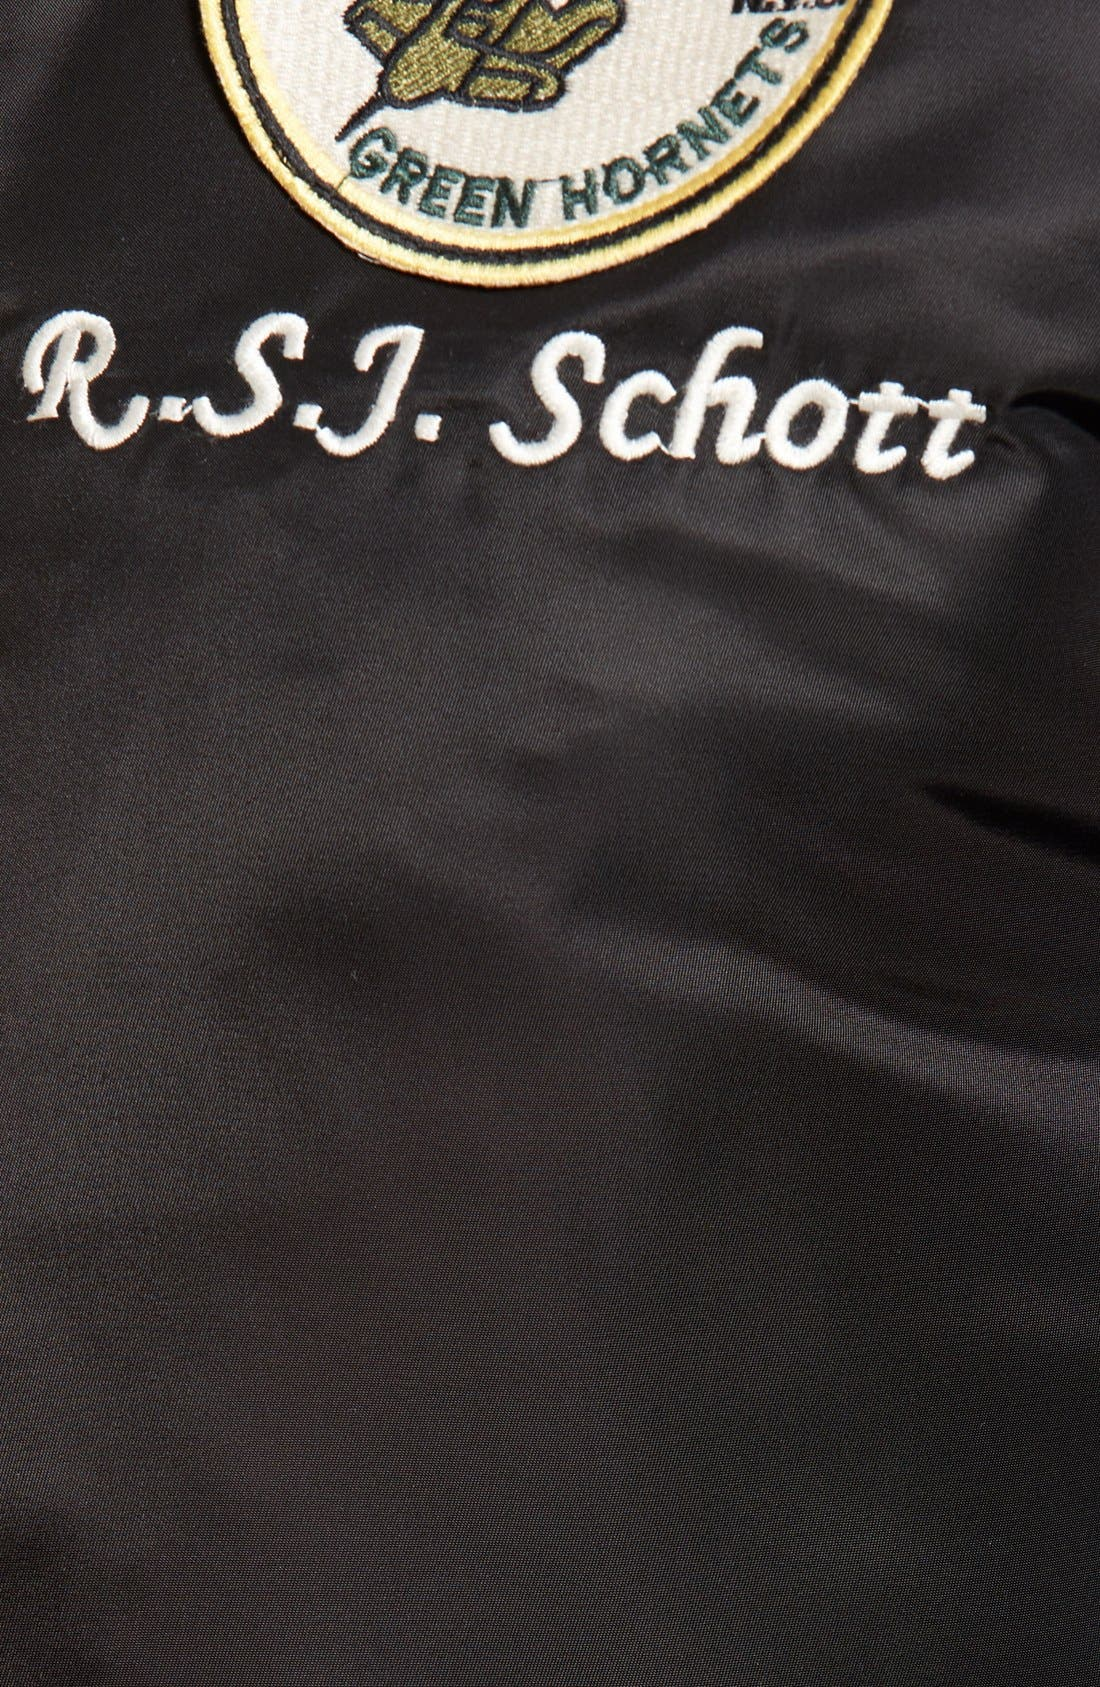 Souvenir MA-1 Flight Jacket,                             Alternate thumbnail 13, color,